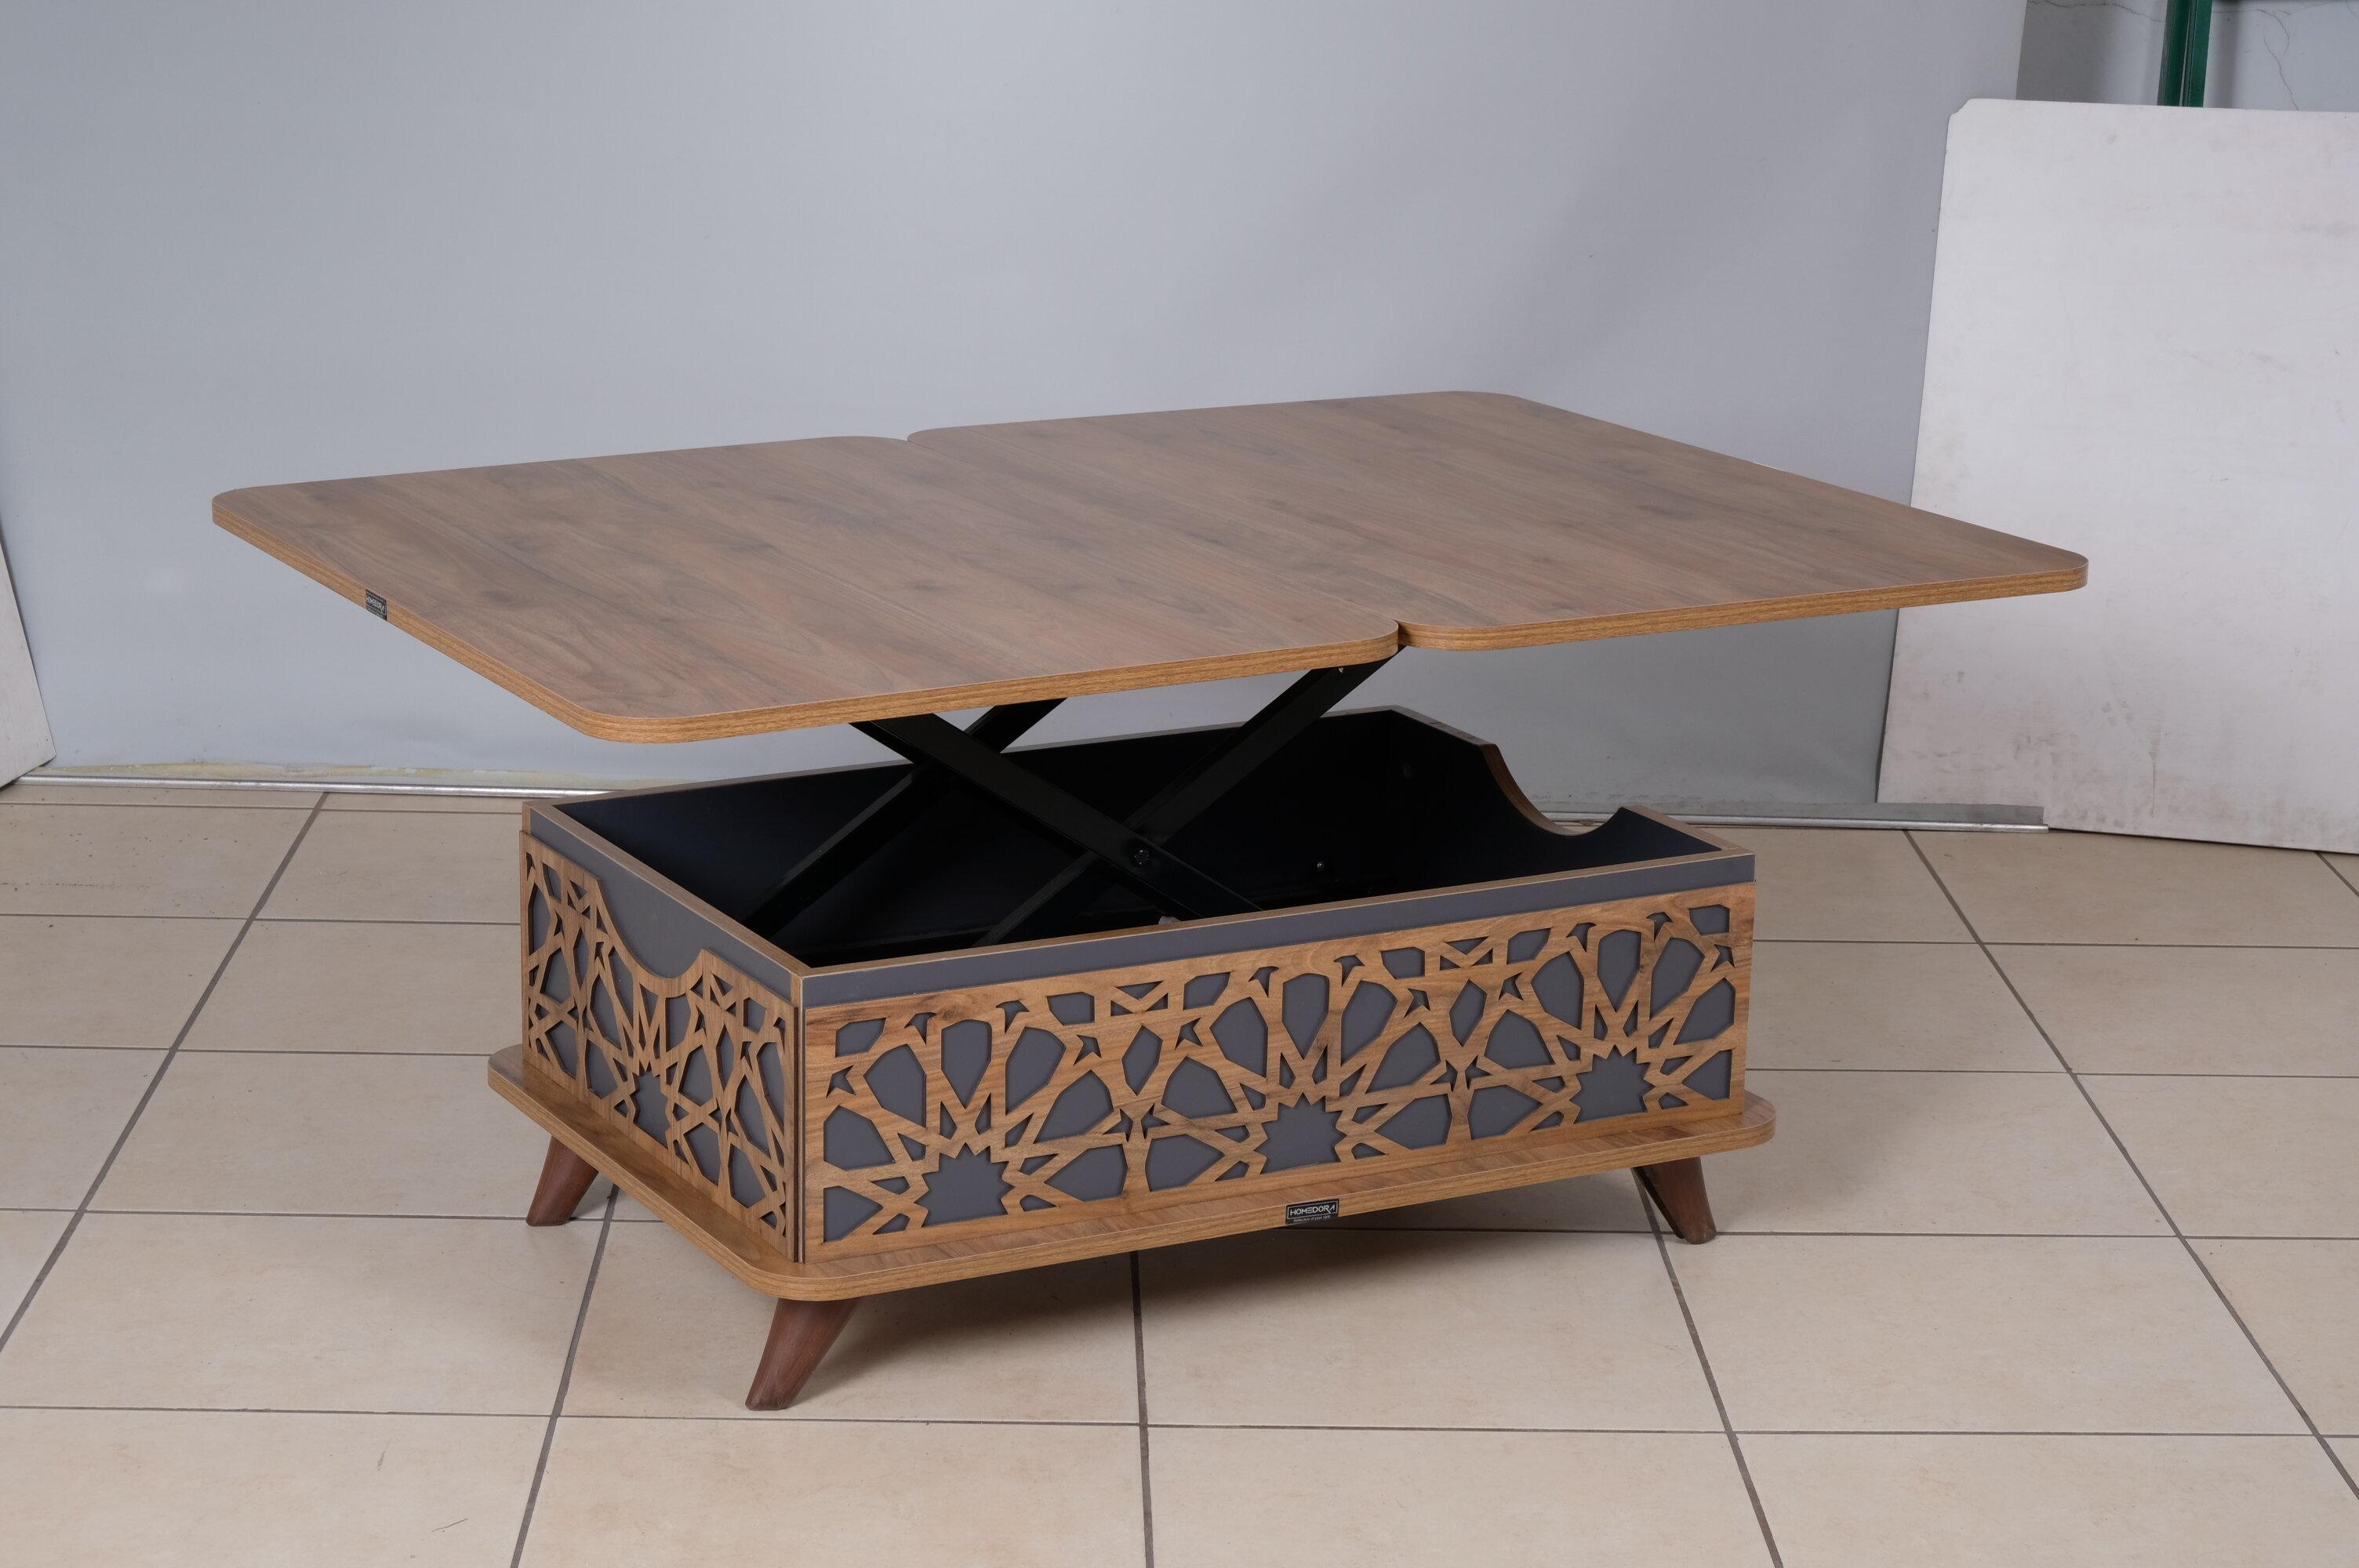 Bungalow Rose Nezperce Lift Top Extendable Coffee Table Wayfair